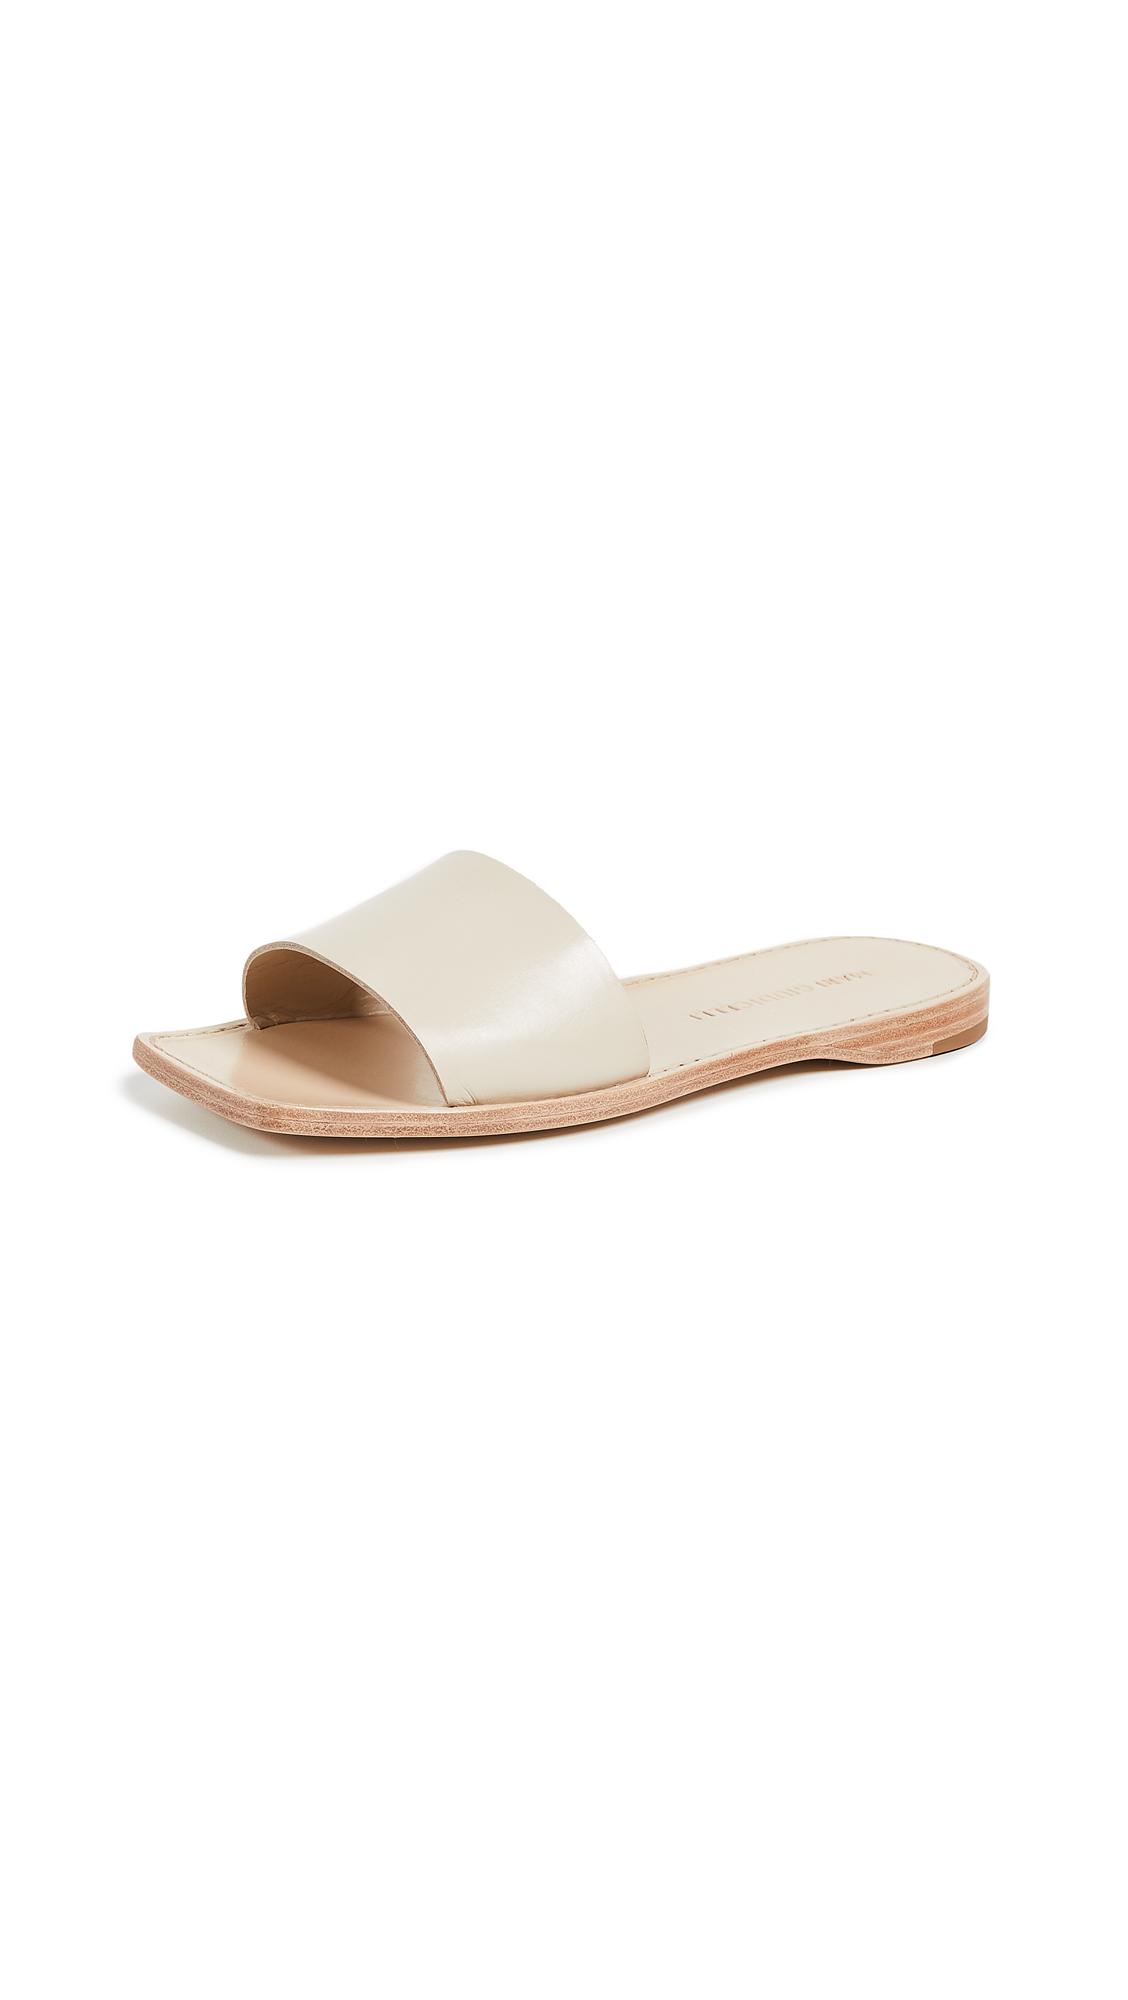 Mari Giudicelli Porto Sandals - Ivory